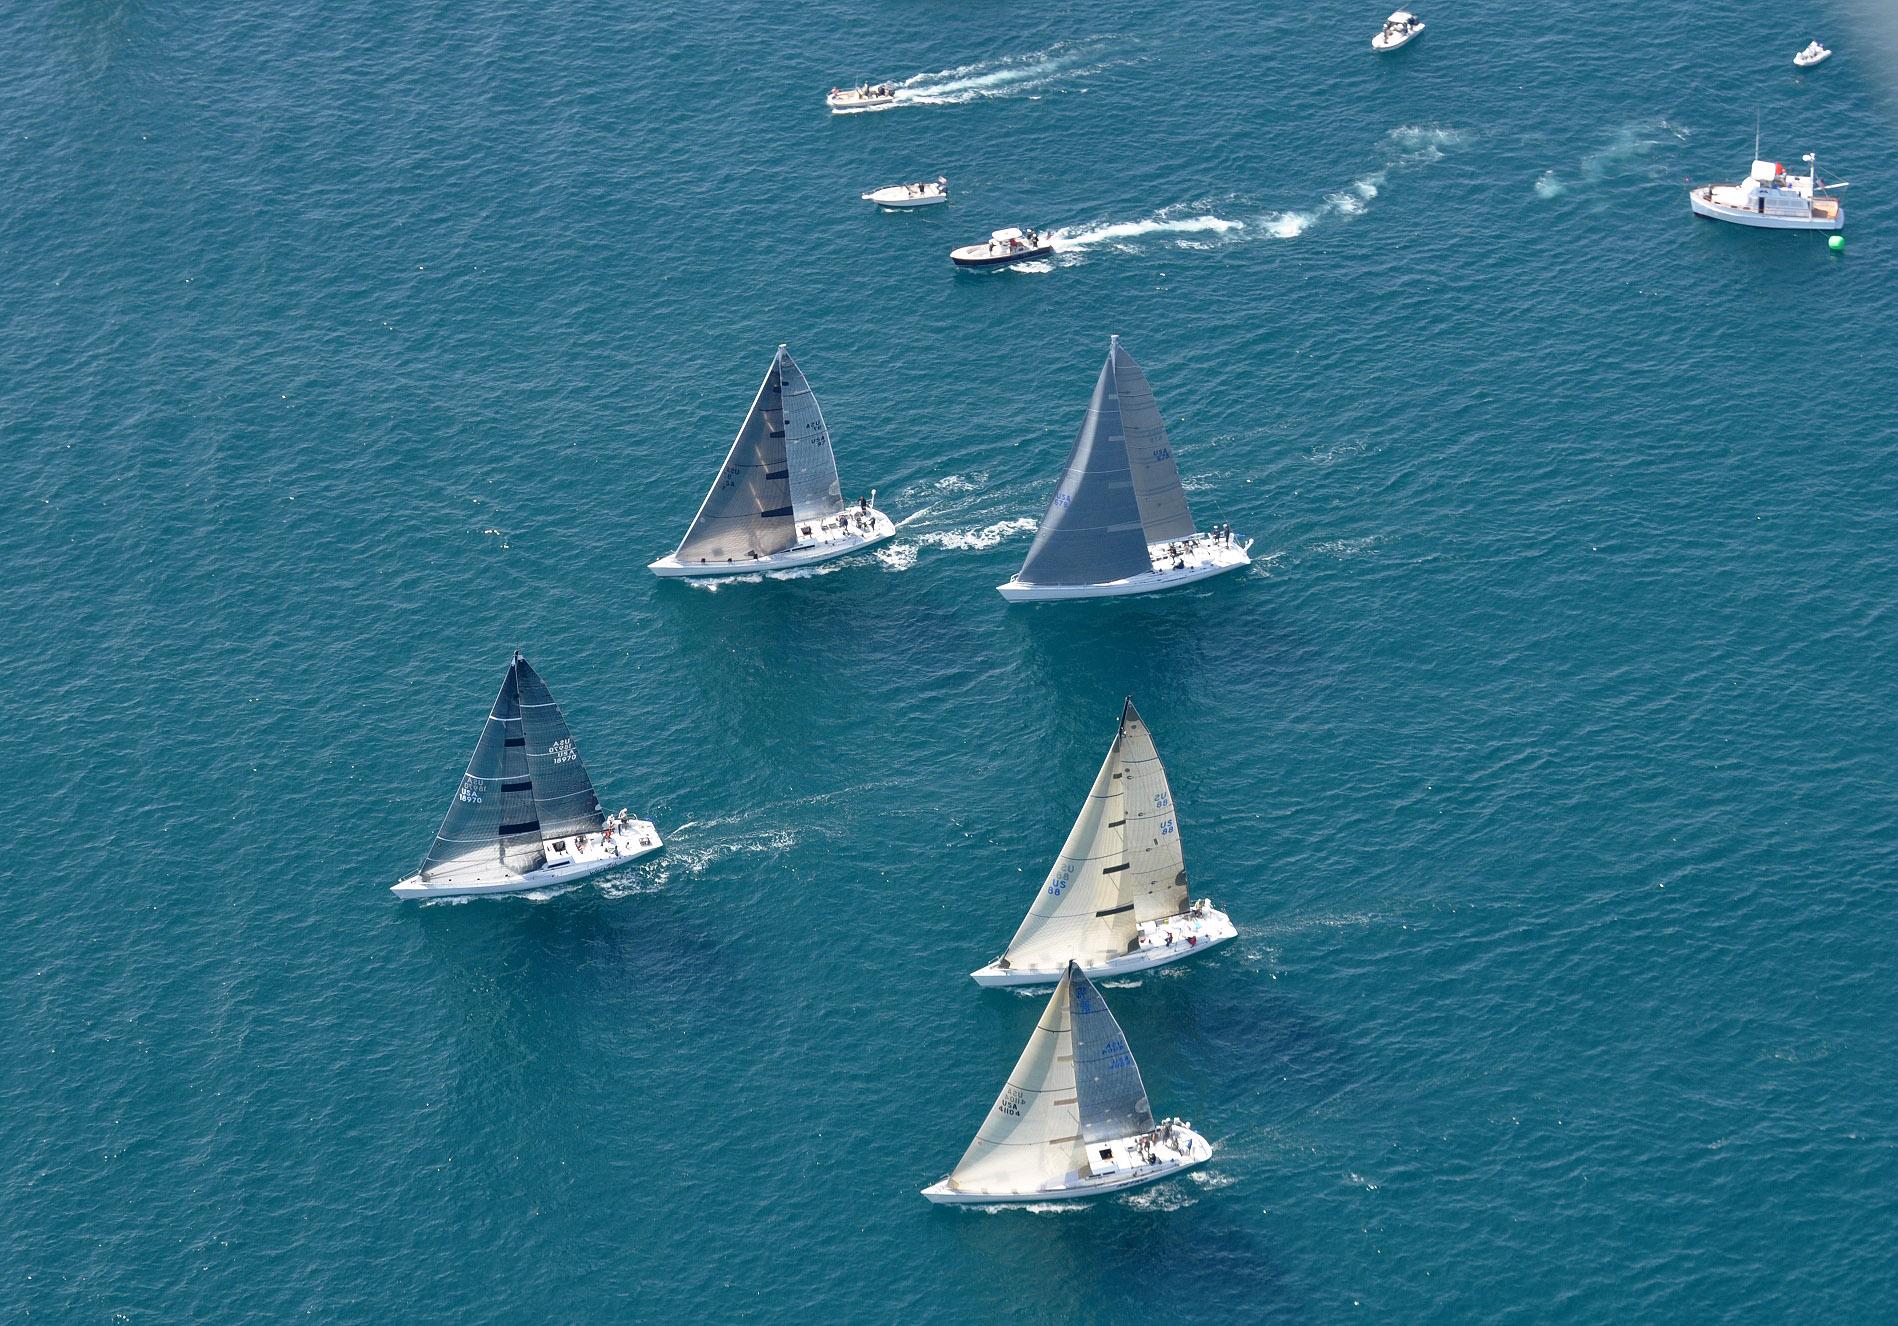 Yacht Racing Wikipedia